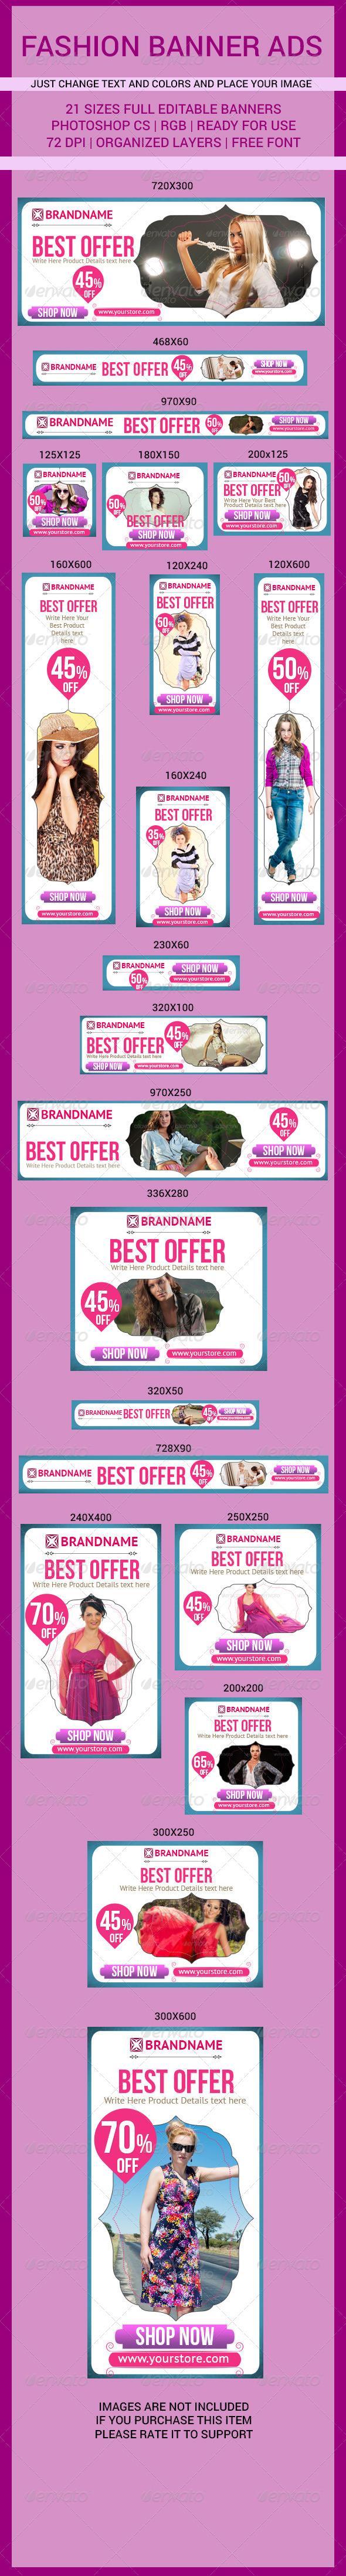 GraphicRiver Fashion Banner Ads 7790136